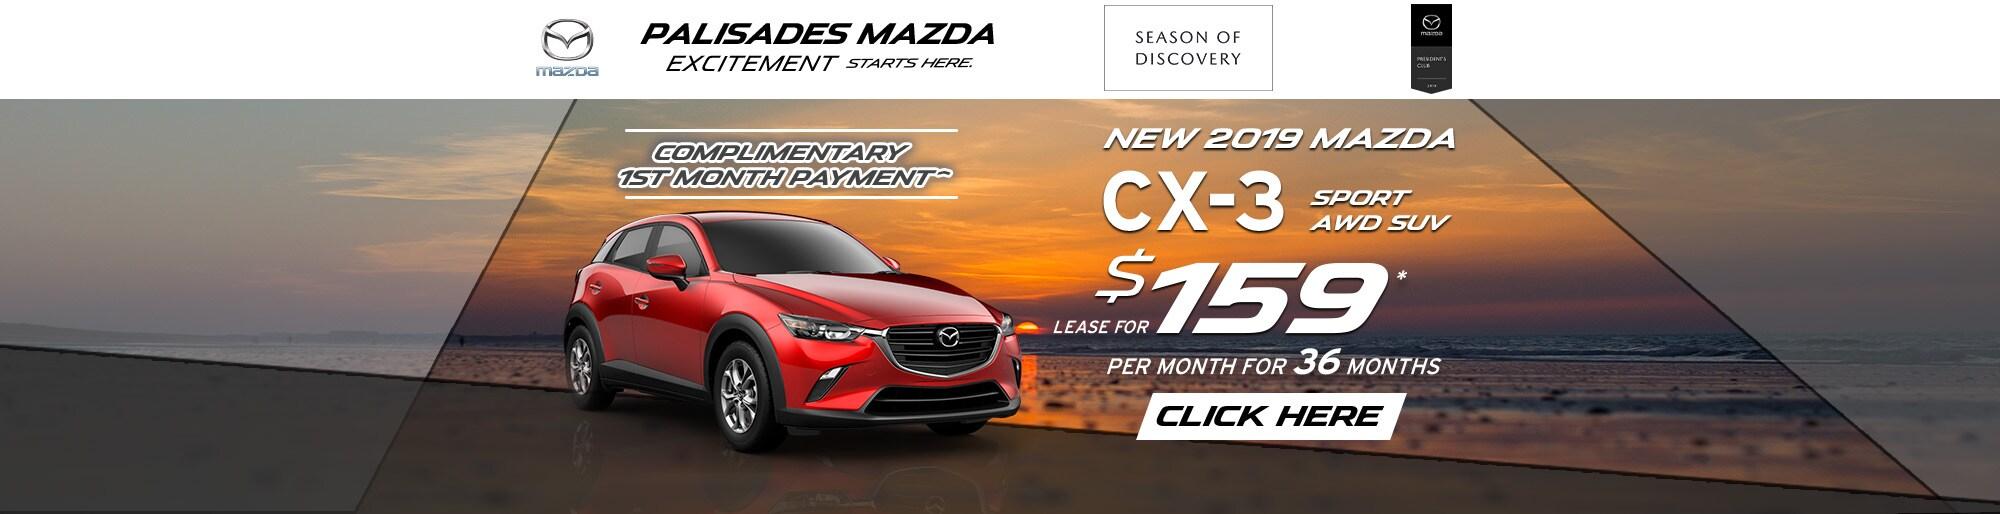 Palisades Mazda New Mazda Dealership In Nyack Ny 10960